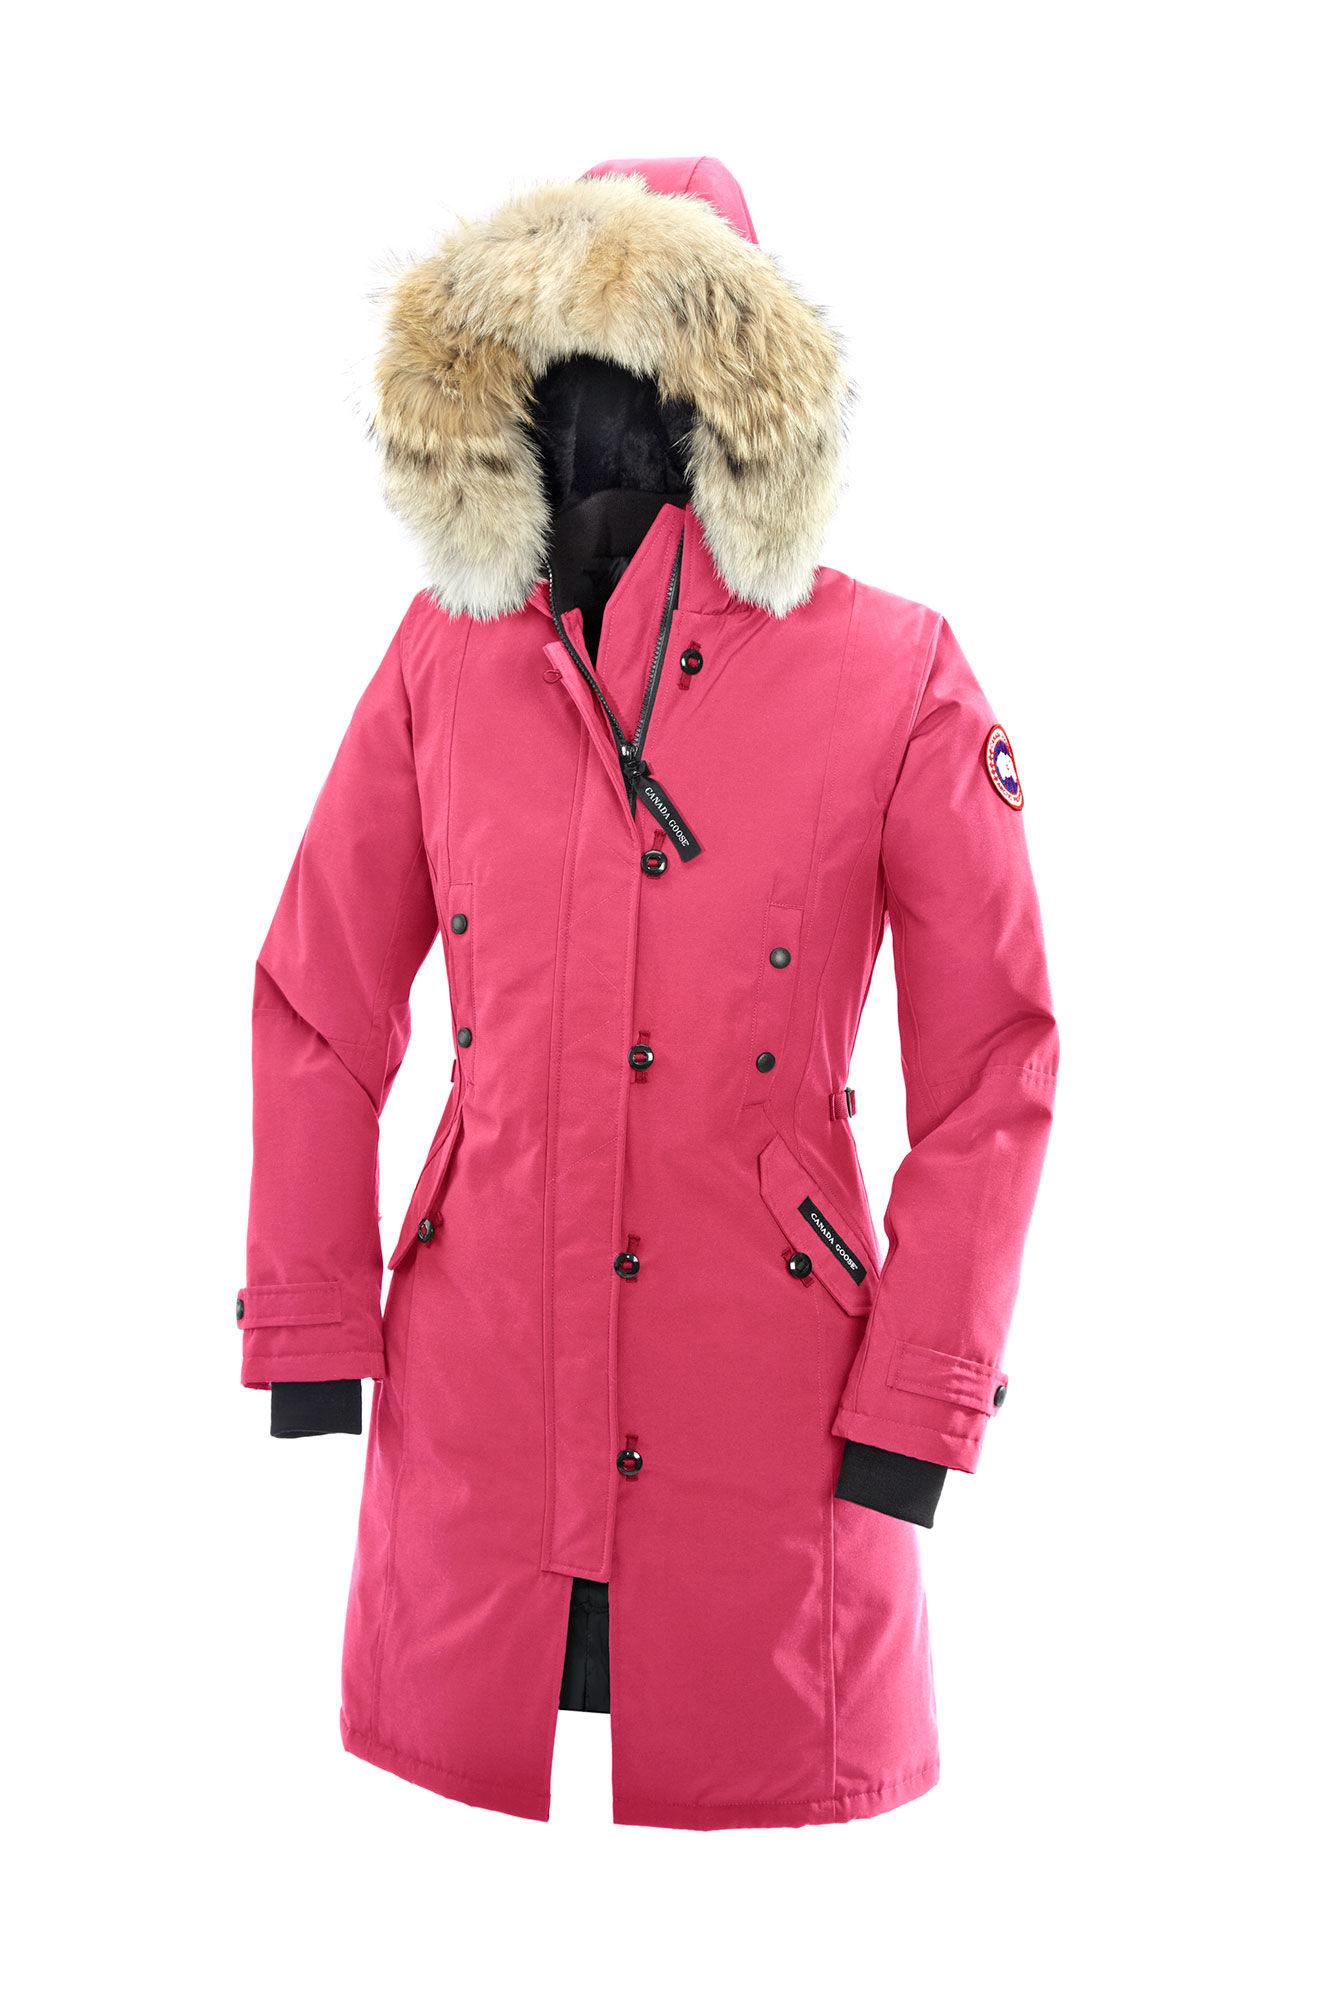 Canada Goose hats online shop - Shop Women's Canada Goose Coats from $470 | Lyst